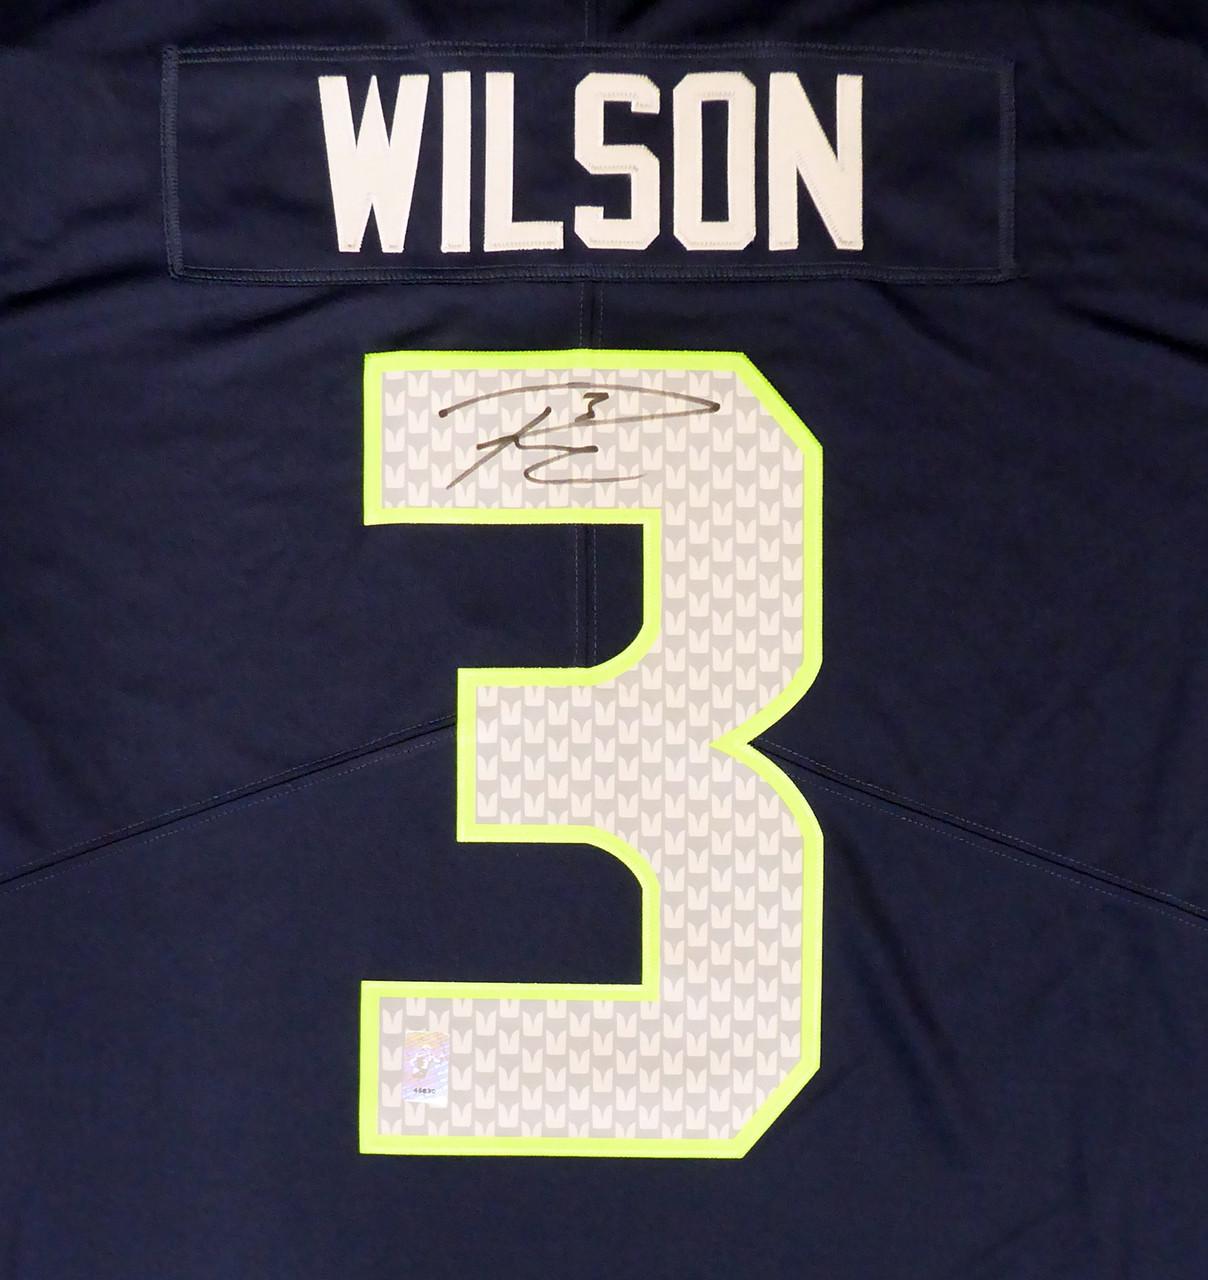 Seattle Seahawks Russell Wilson Autographed Blue Nike Twill Jersey Size XXL RW Holo Stock #159117